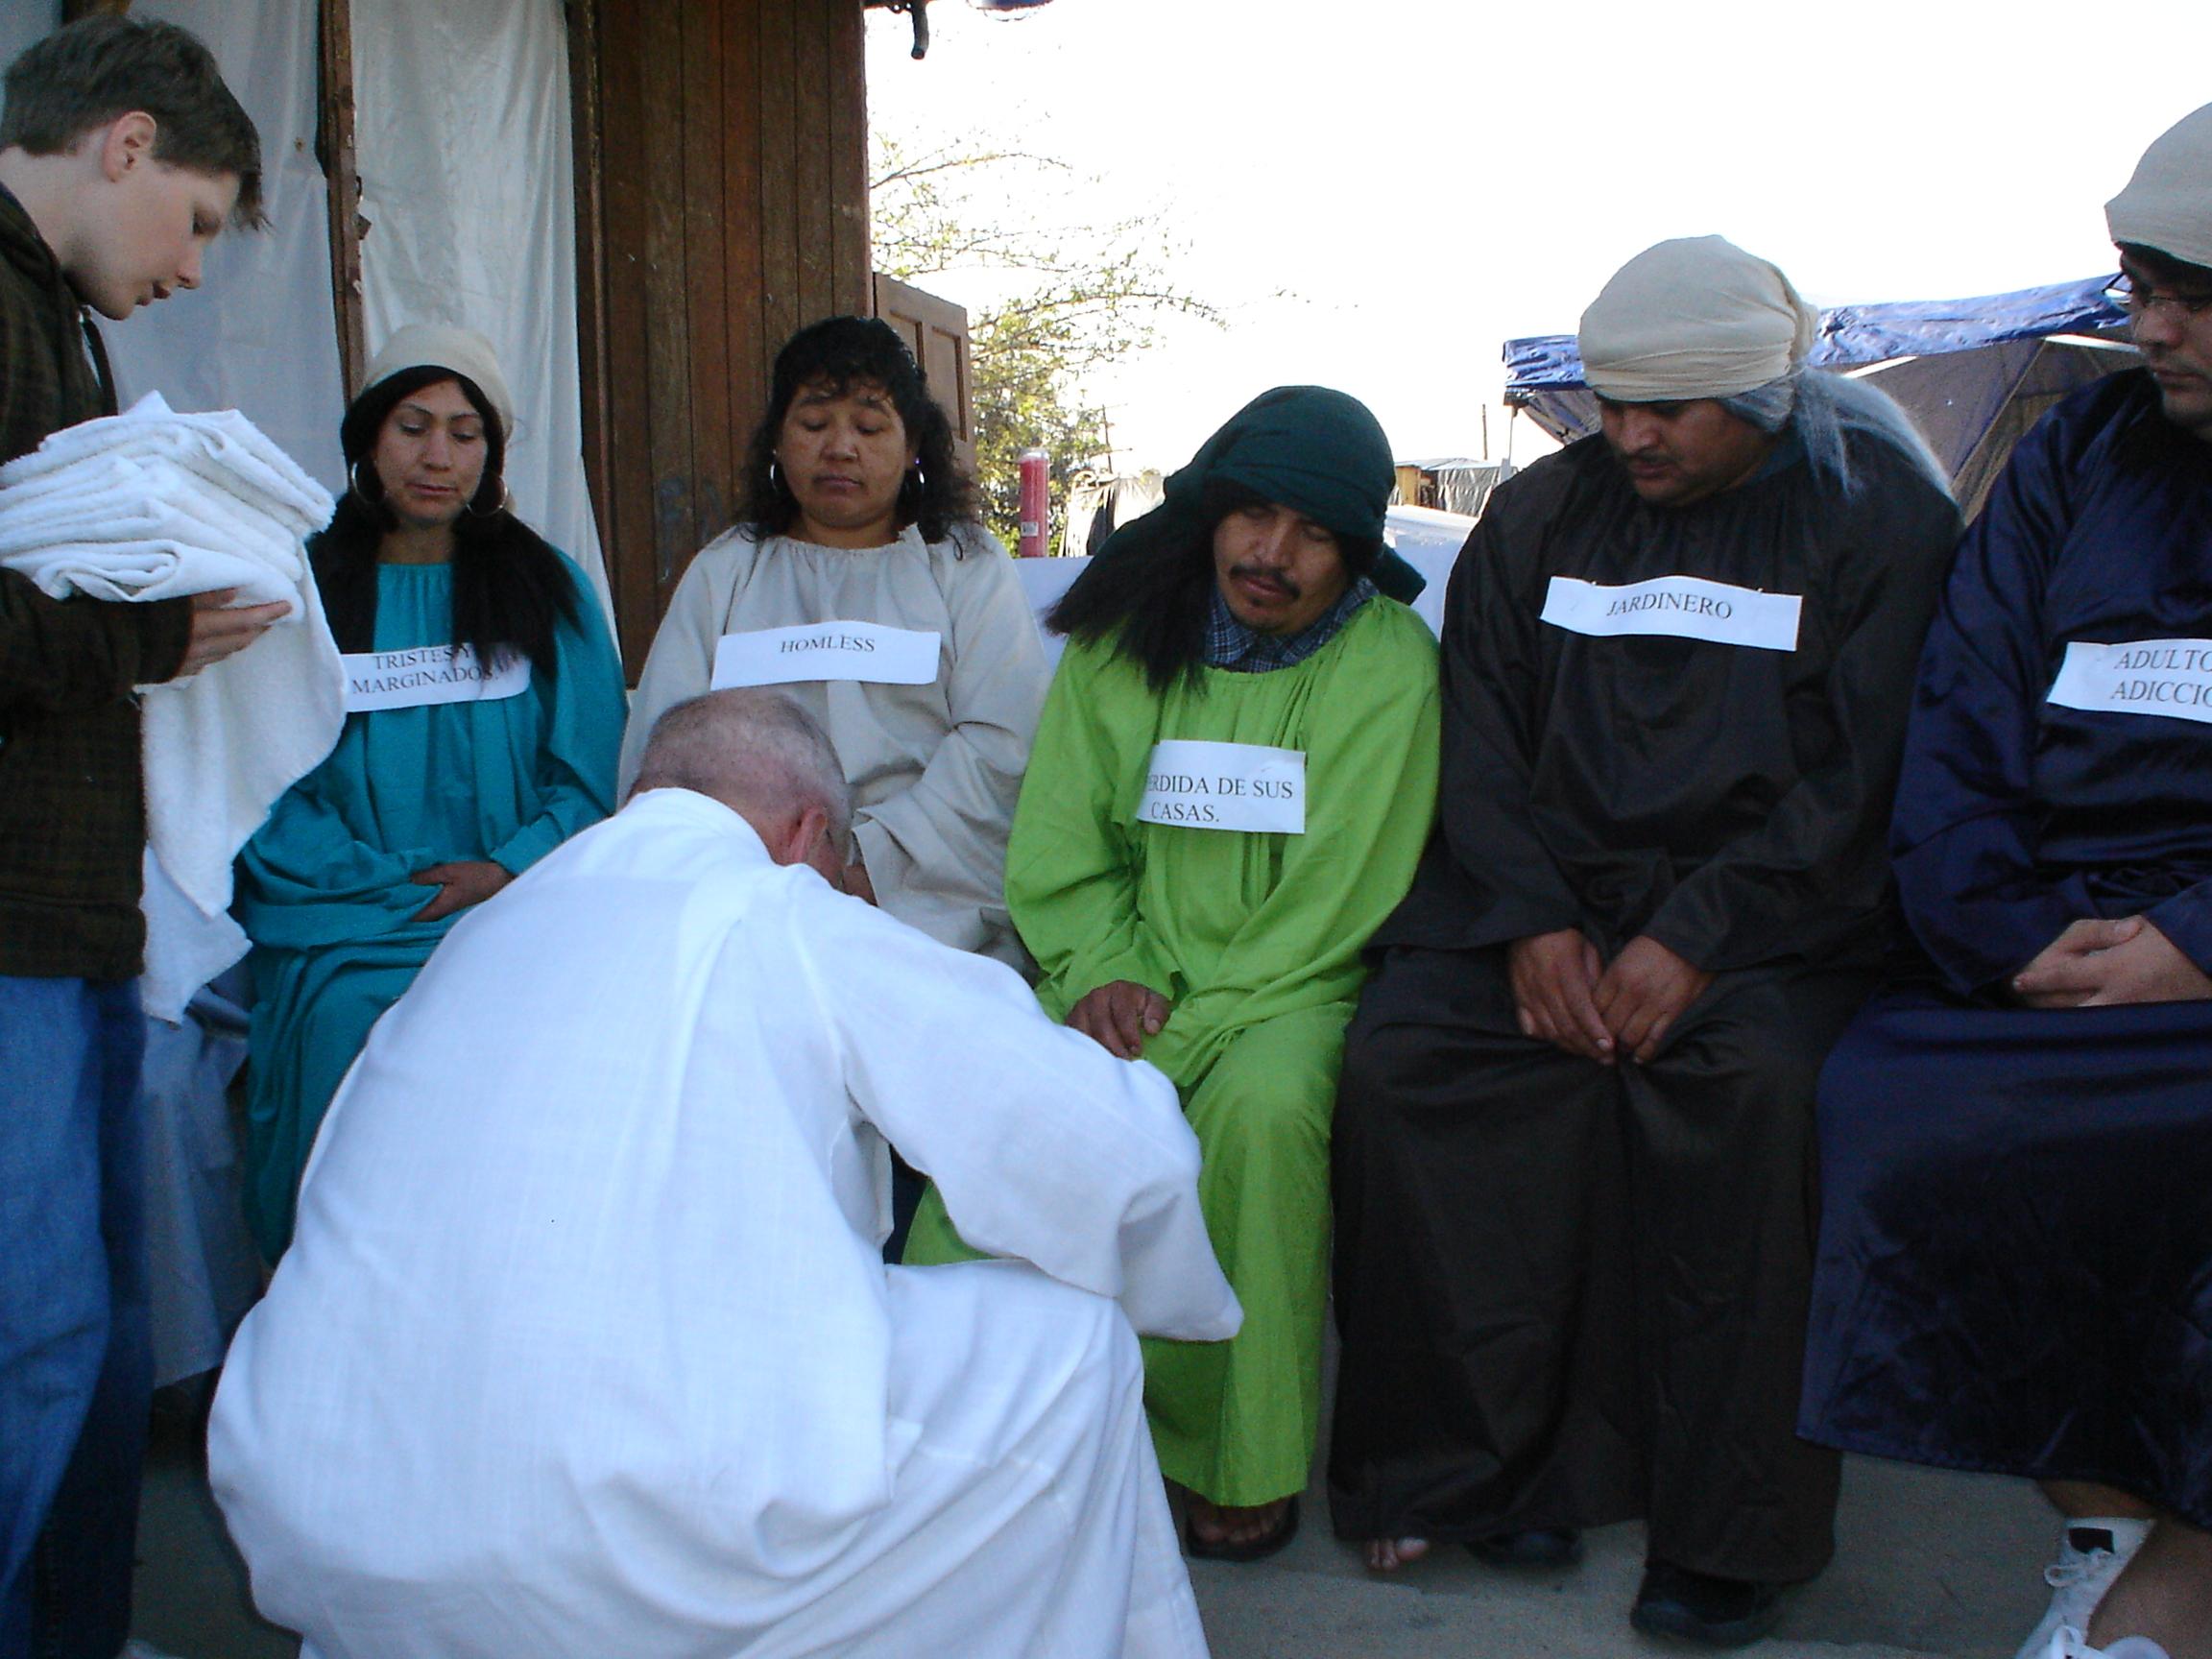 Mission of Padre Migrante: Jesus is not found in the middle - Jesús no se encuentra en el medio